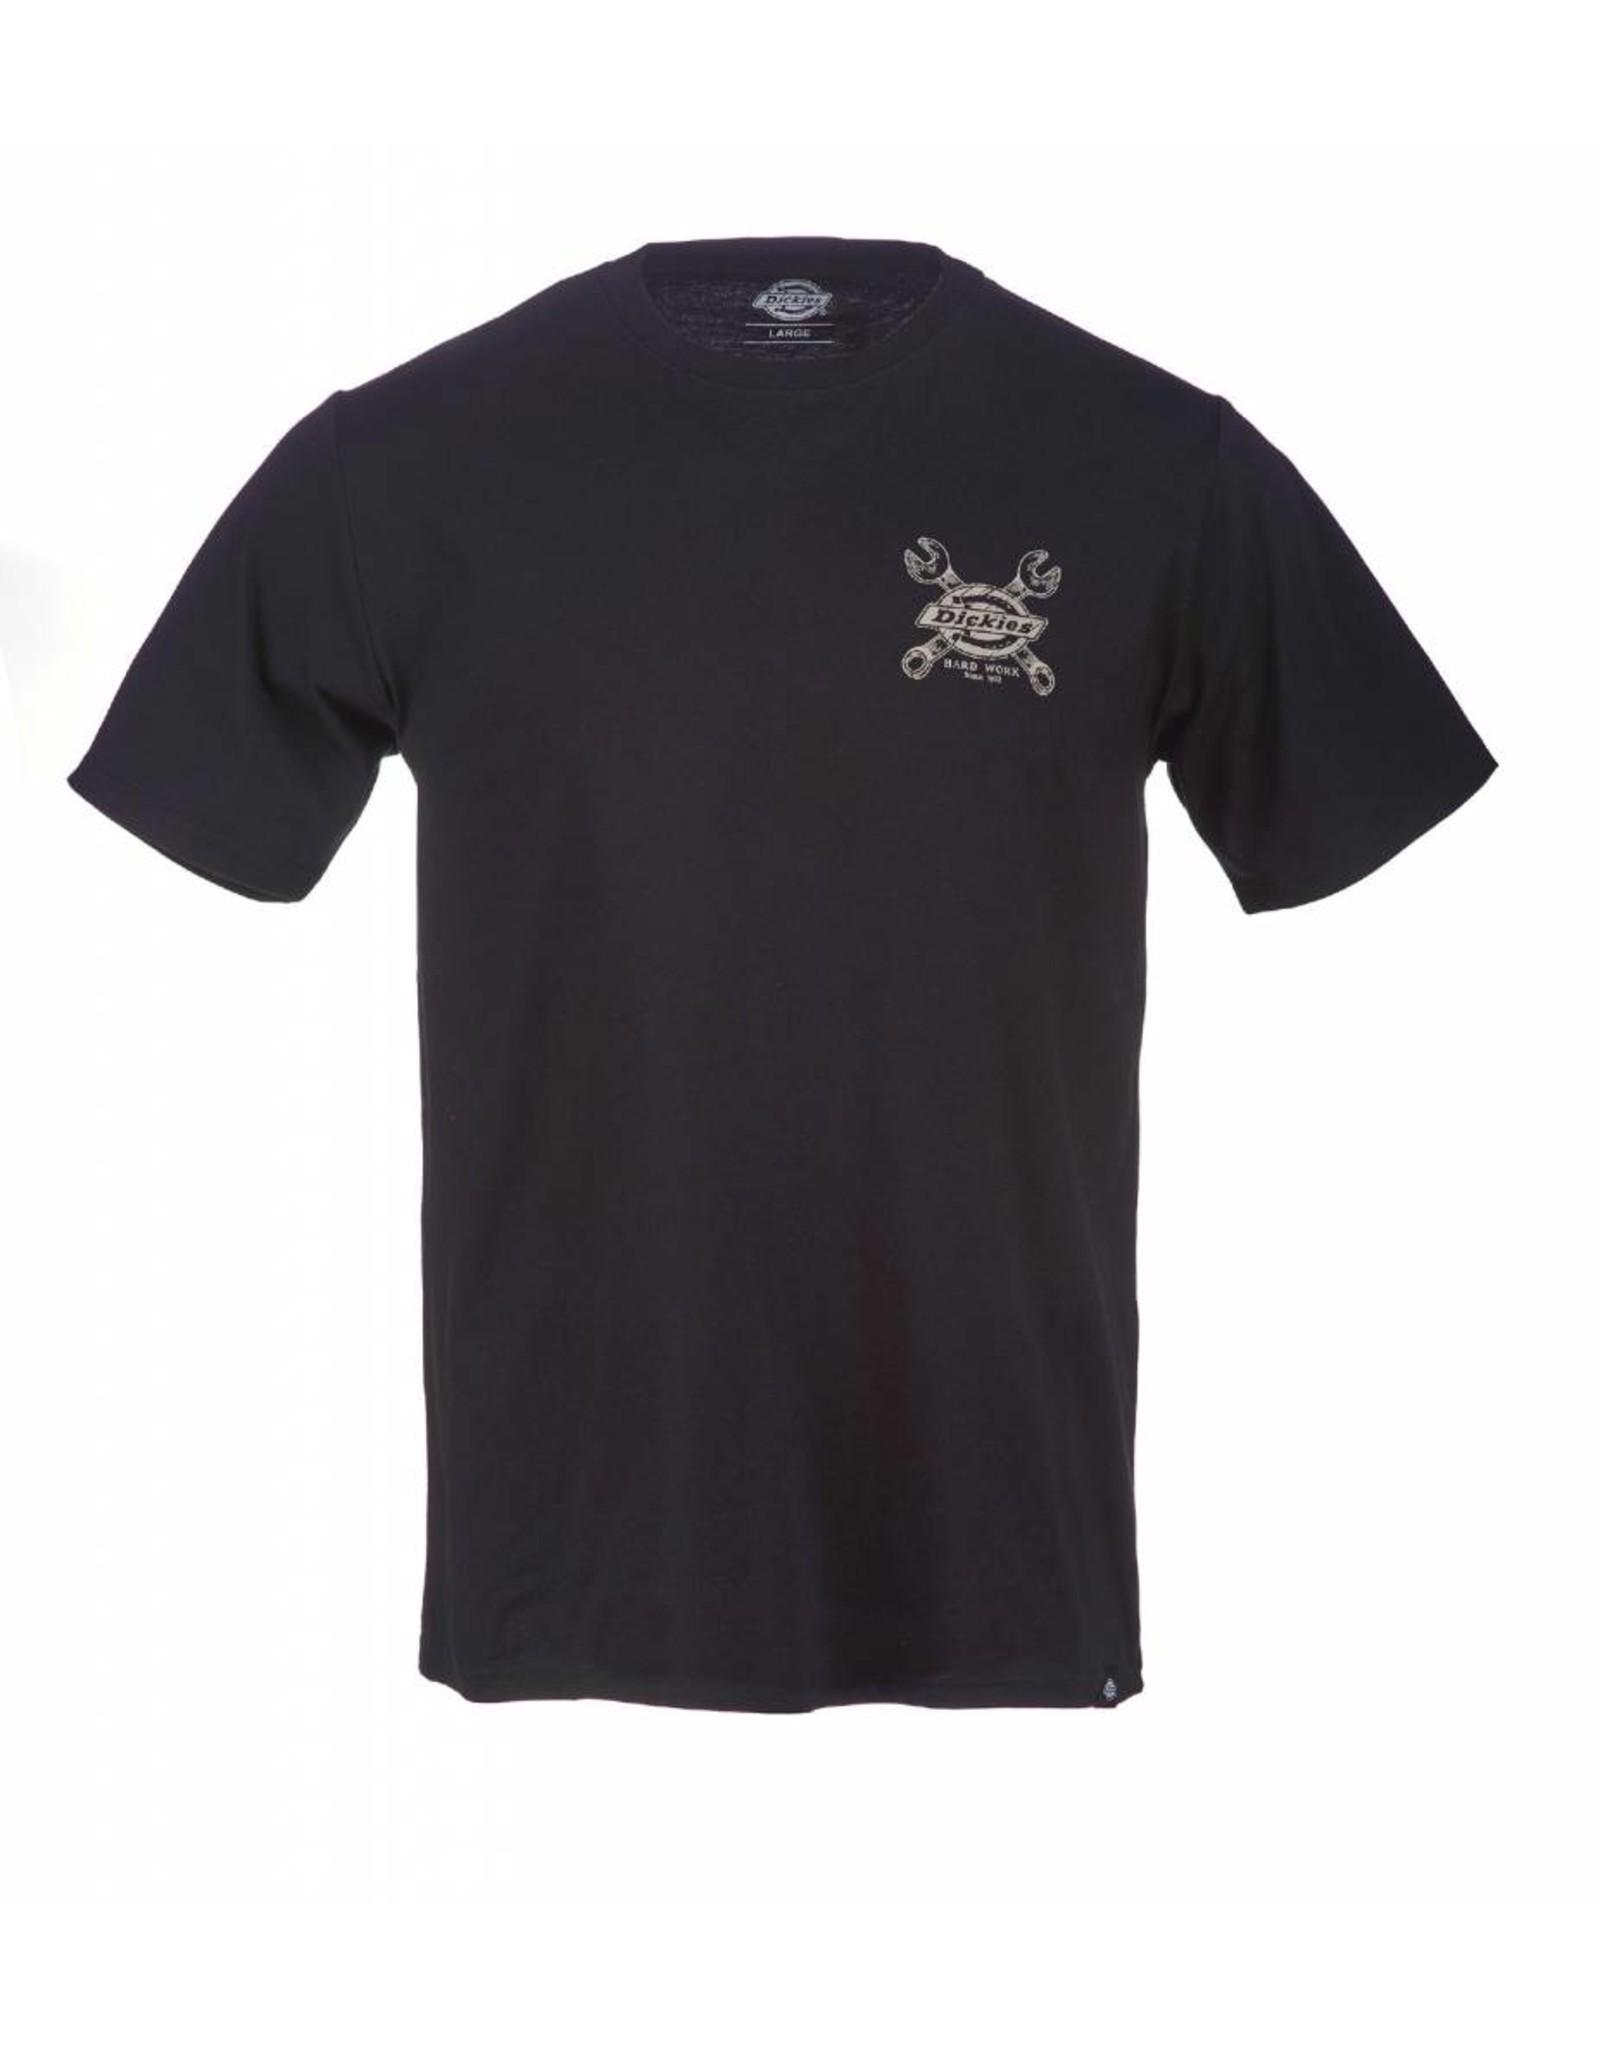 Dickies Dickies Toano T-shirt